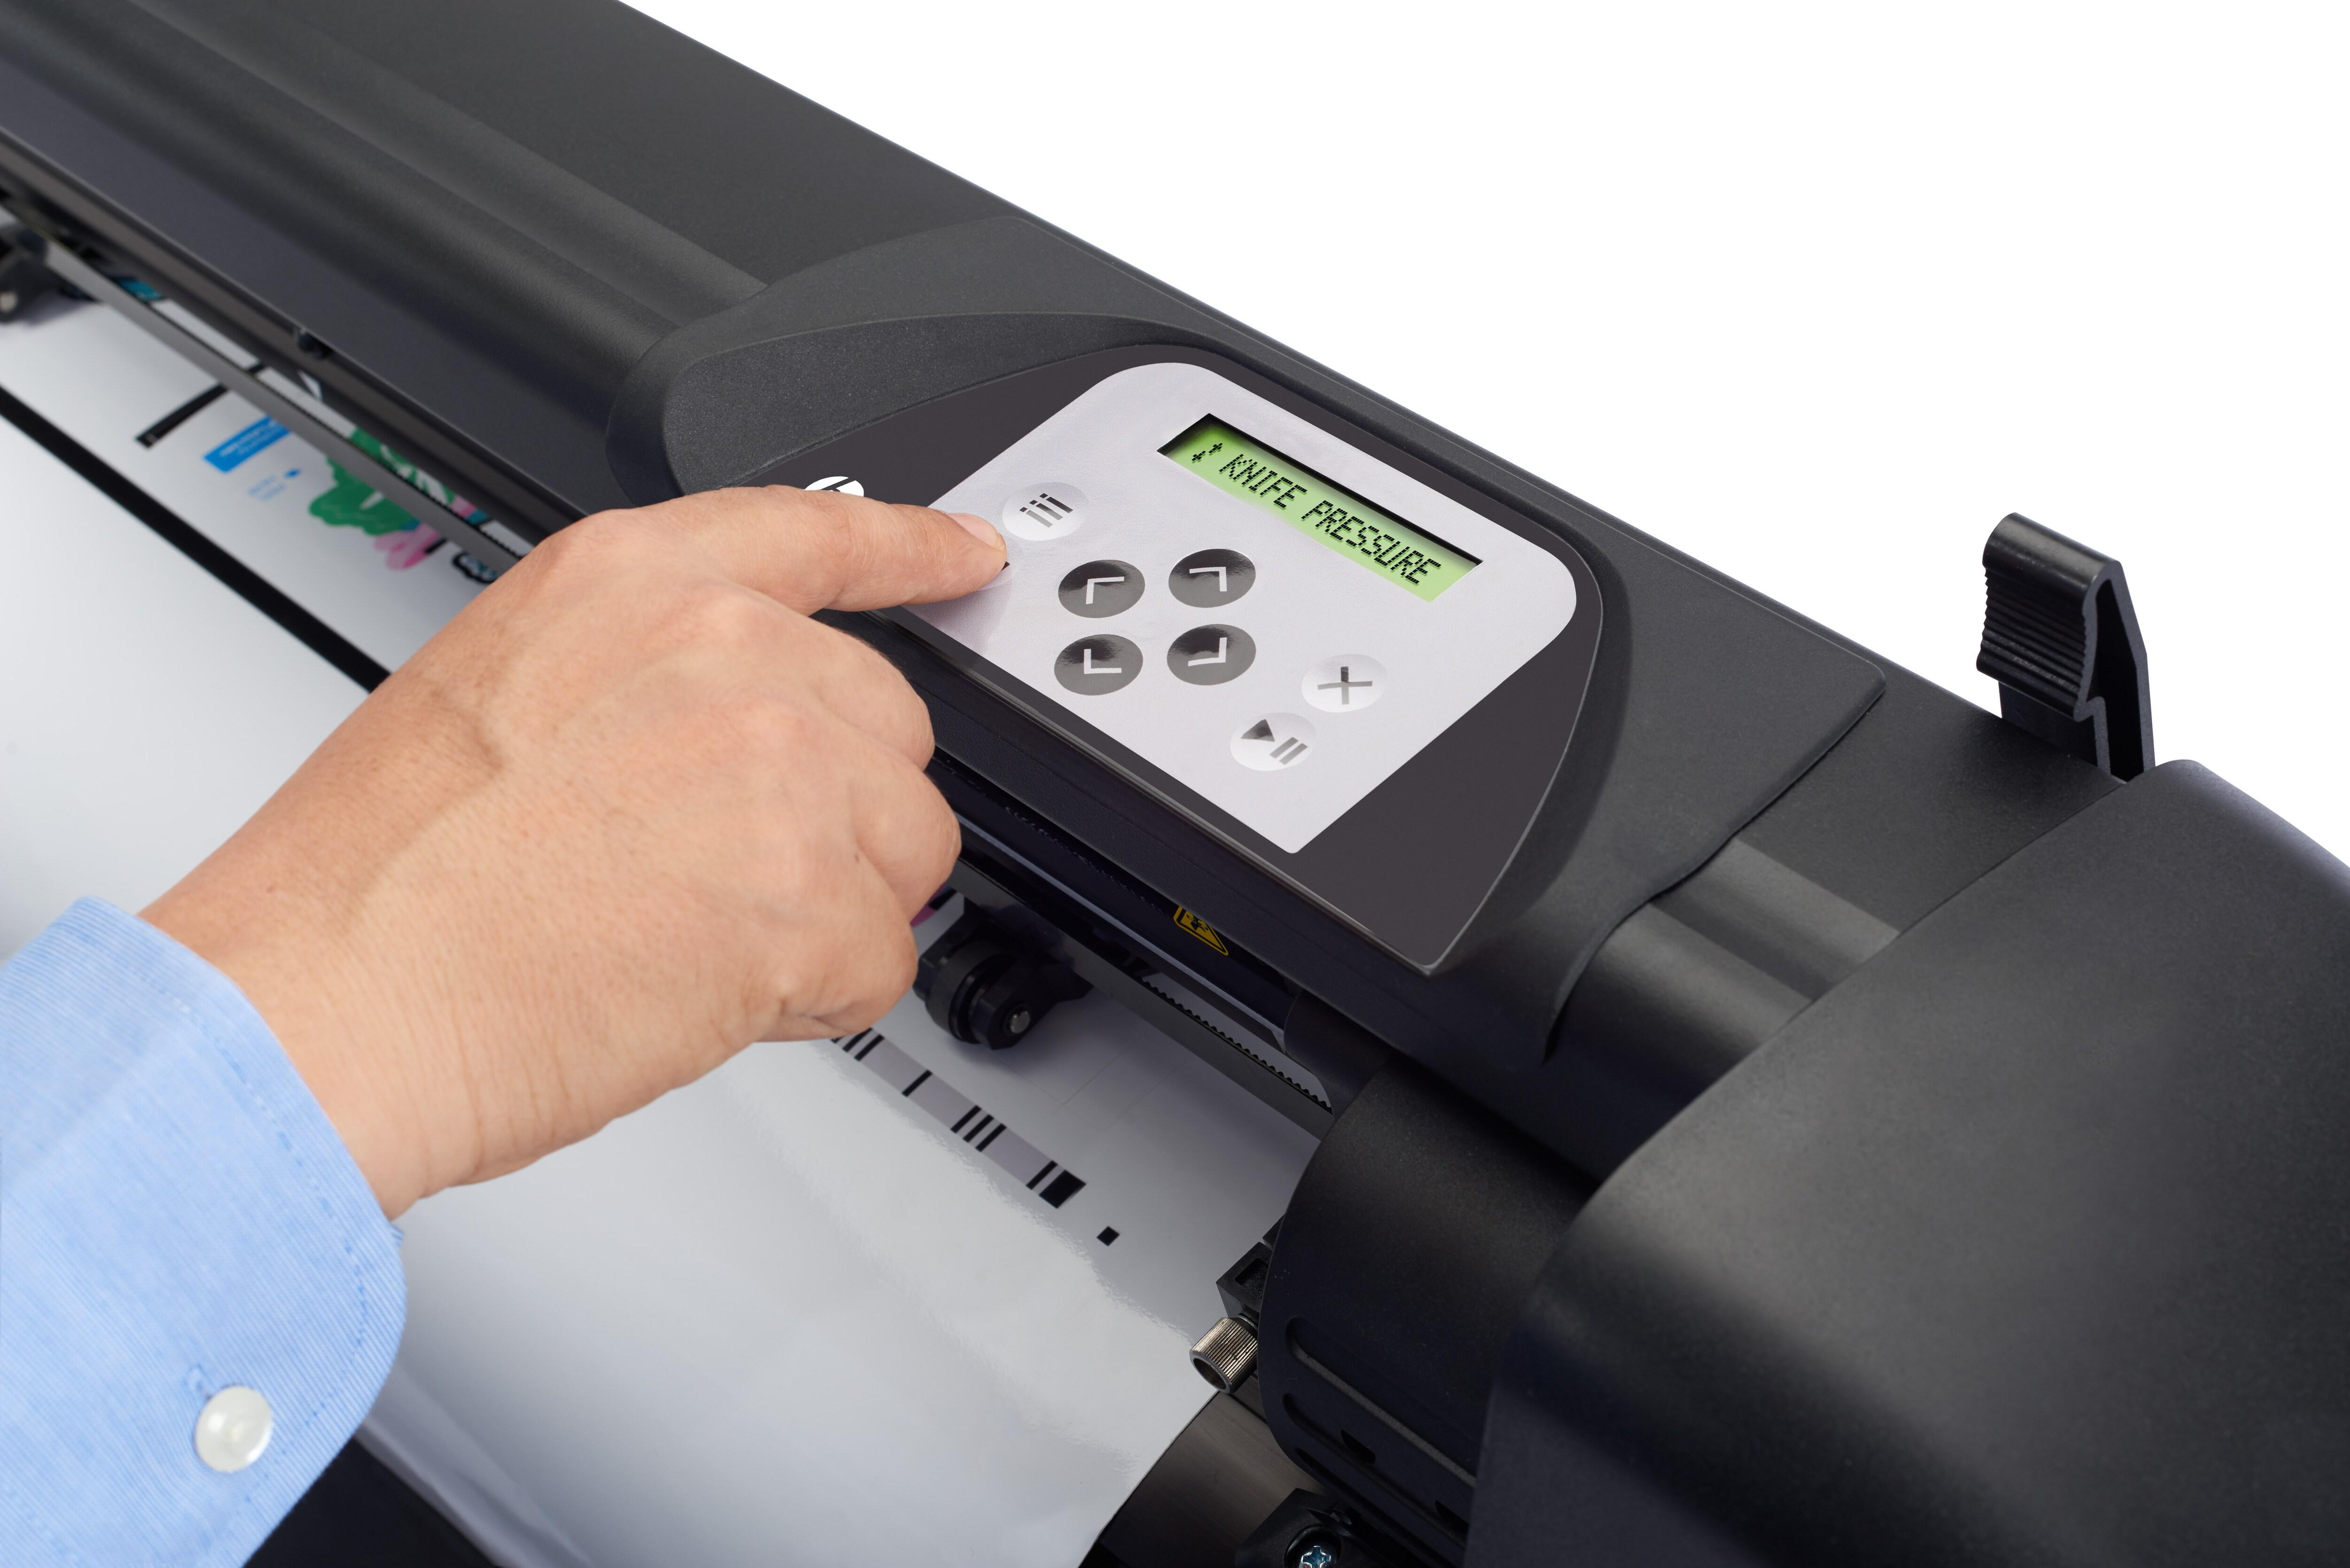 Программно-аппаратный комплекс для широкоформатной печати и плоттерной резкиHP Latex 335 Print and Cut Solution - фото 5